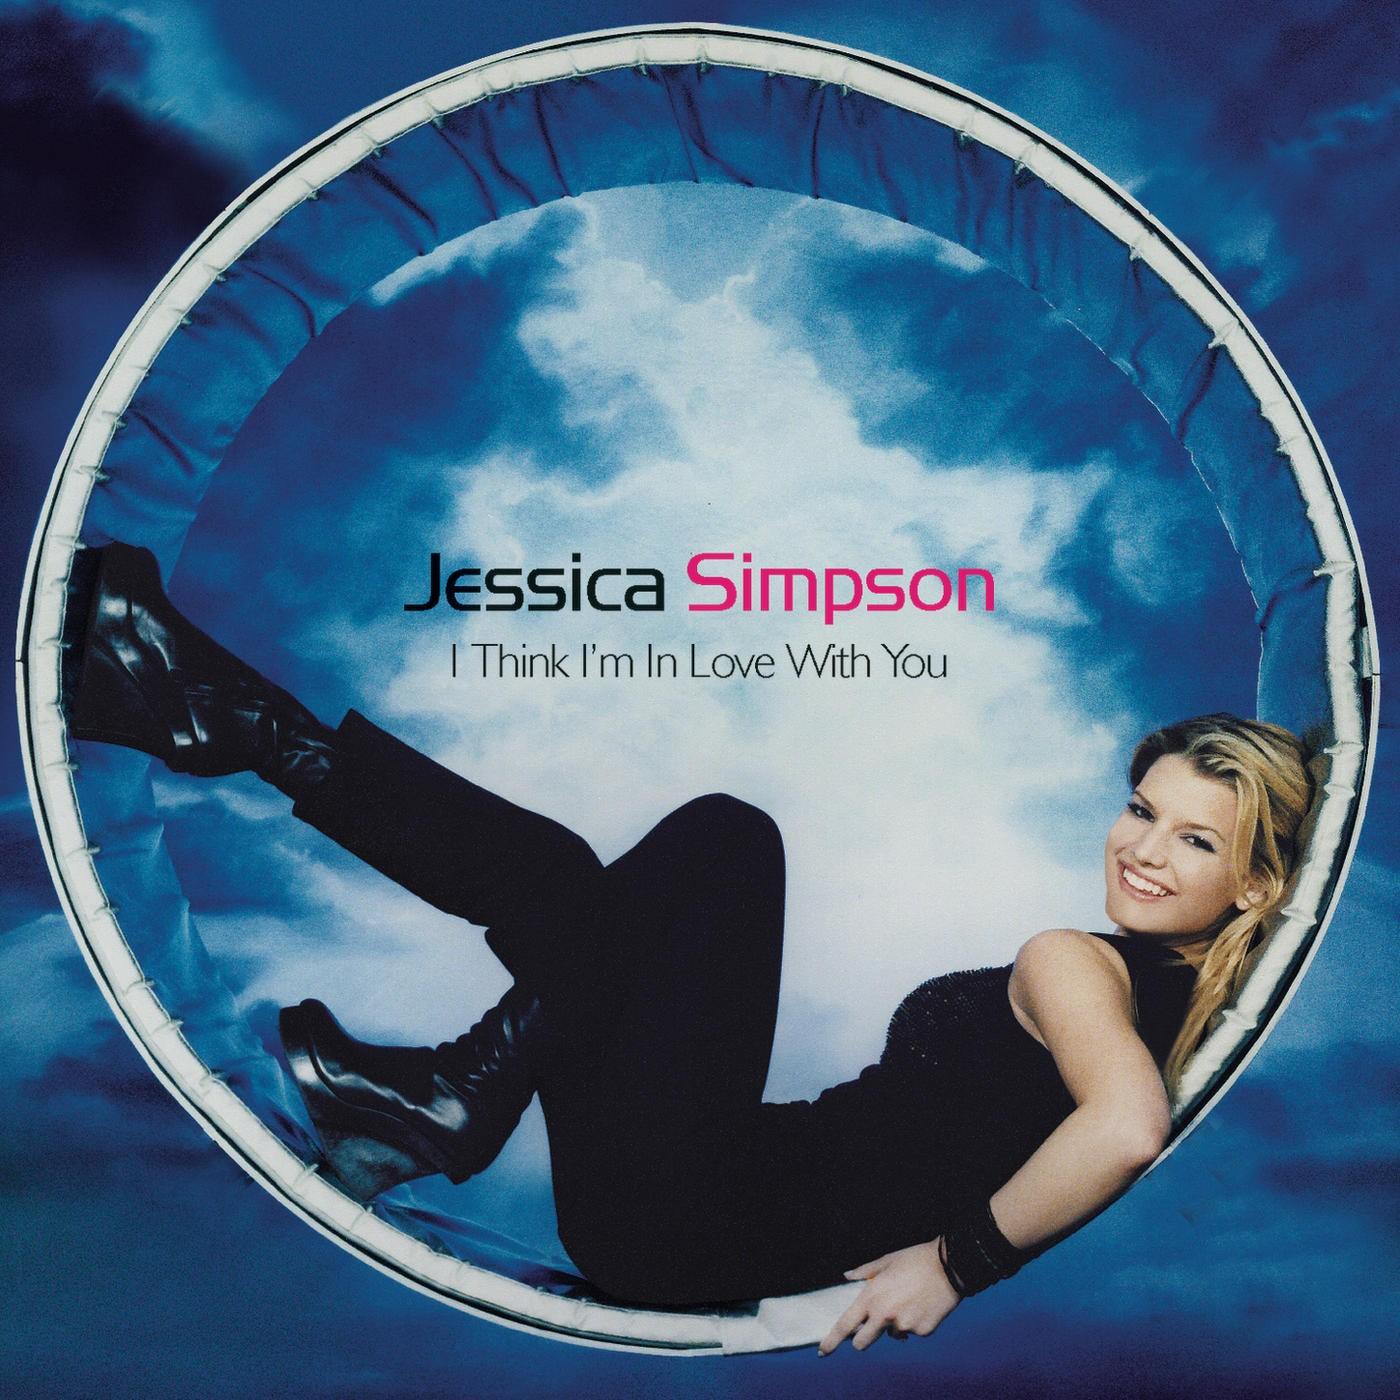 http://2.bp.blogspot.com/-5lAYzFpp3Xs/T2N8Gg-ulGI/AAAAAAAALpE/JzGWBzTiqpM/s1600/%255BAllCDCovers%255D_jessica_simpson_i_think_im_in_love_with_you_2000_retail_cd-front.jpg